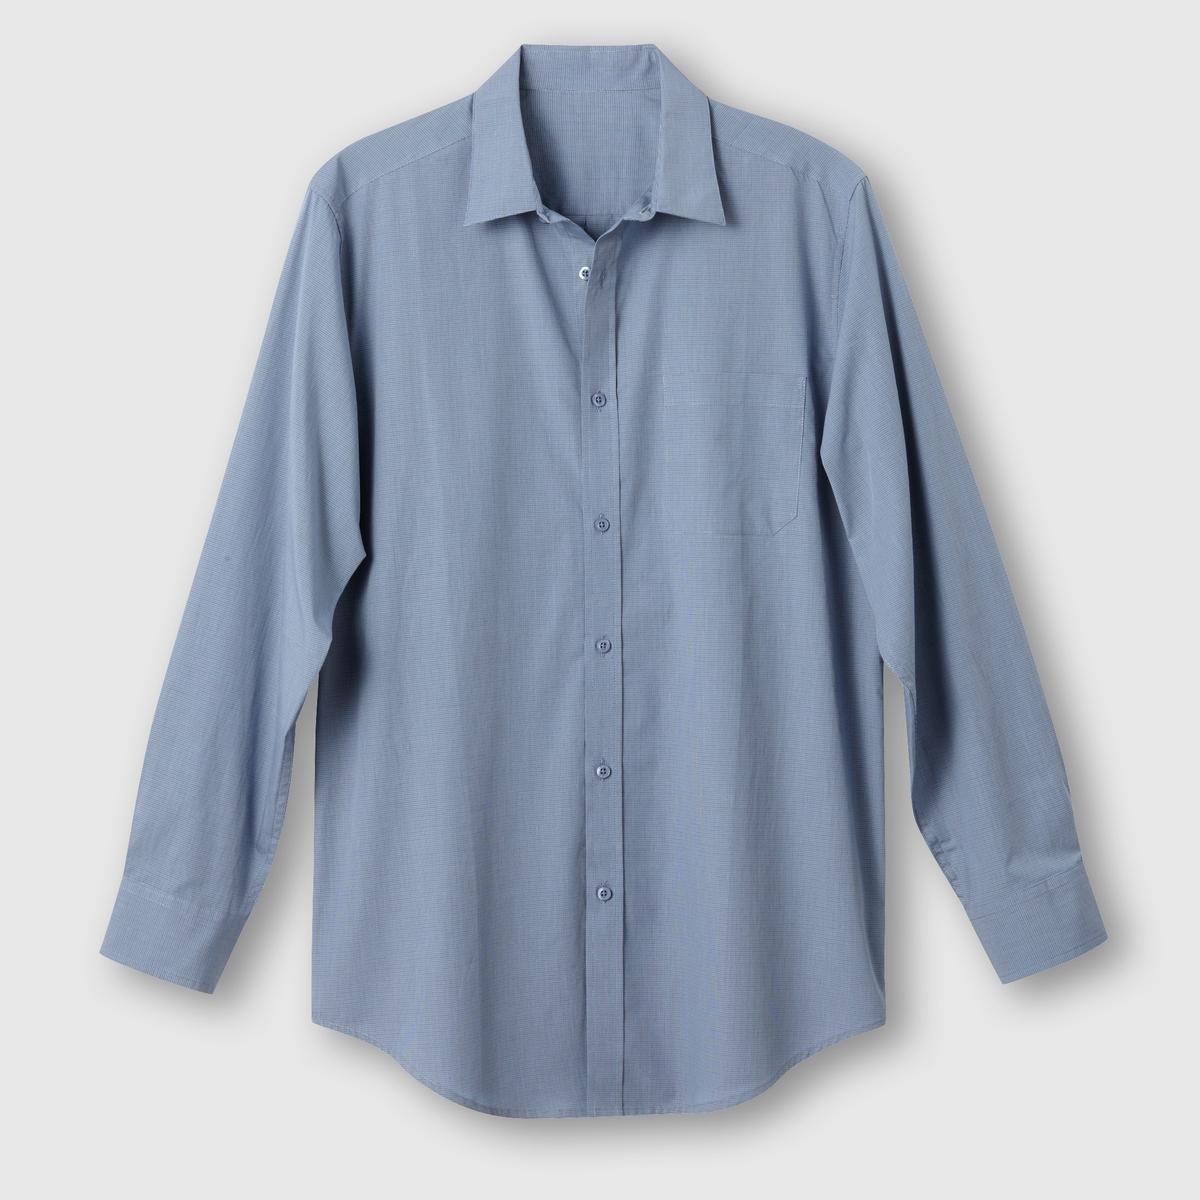 Рубашка из поплина, рост 2 (от 1,76 до 1,87 м)